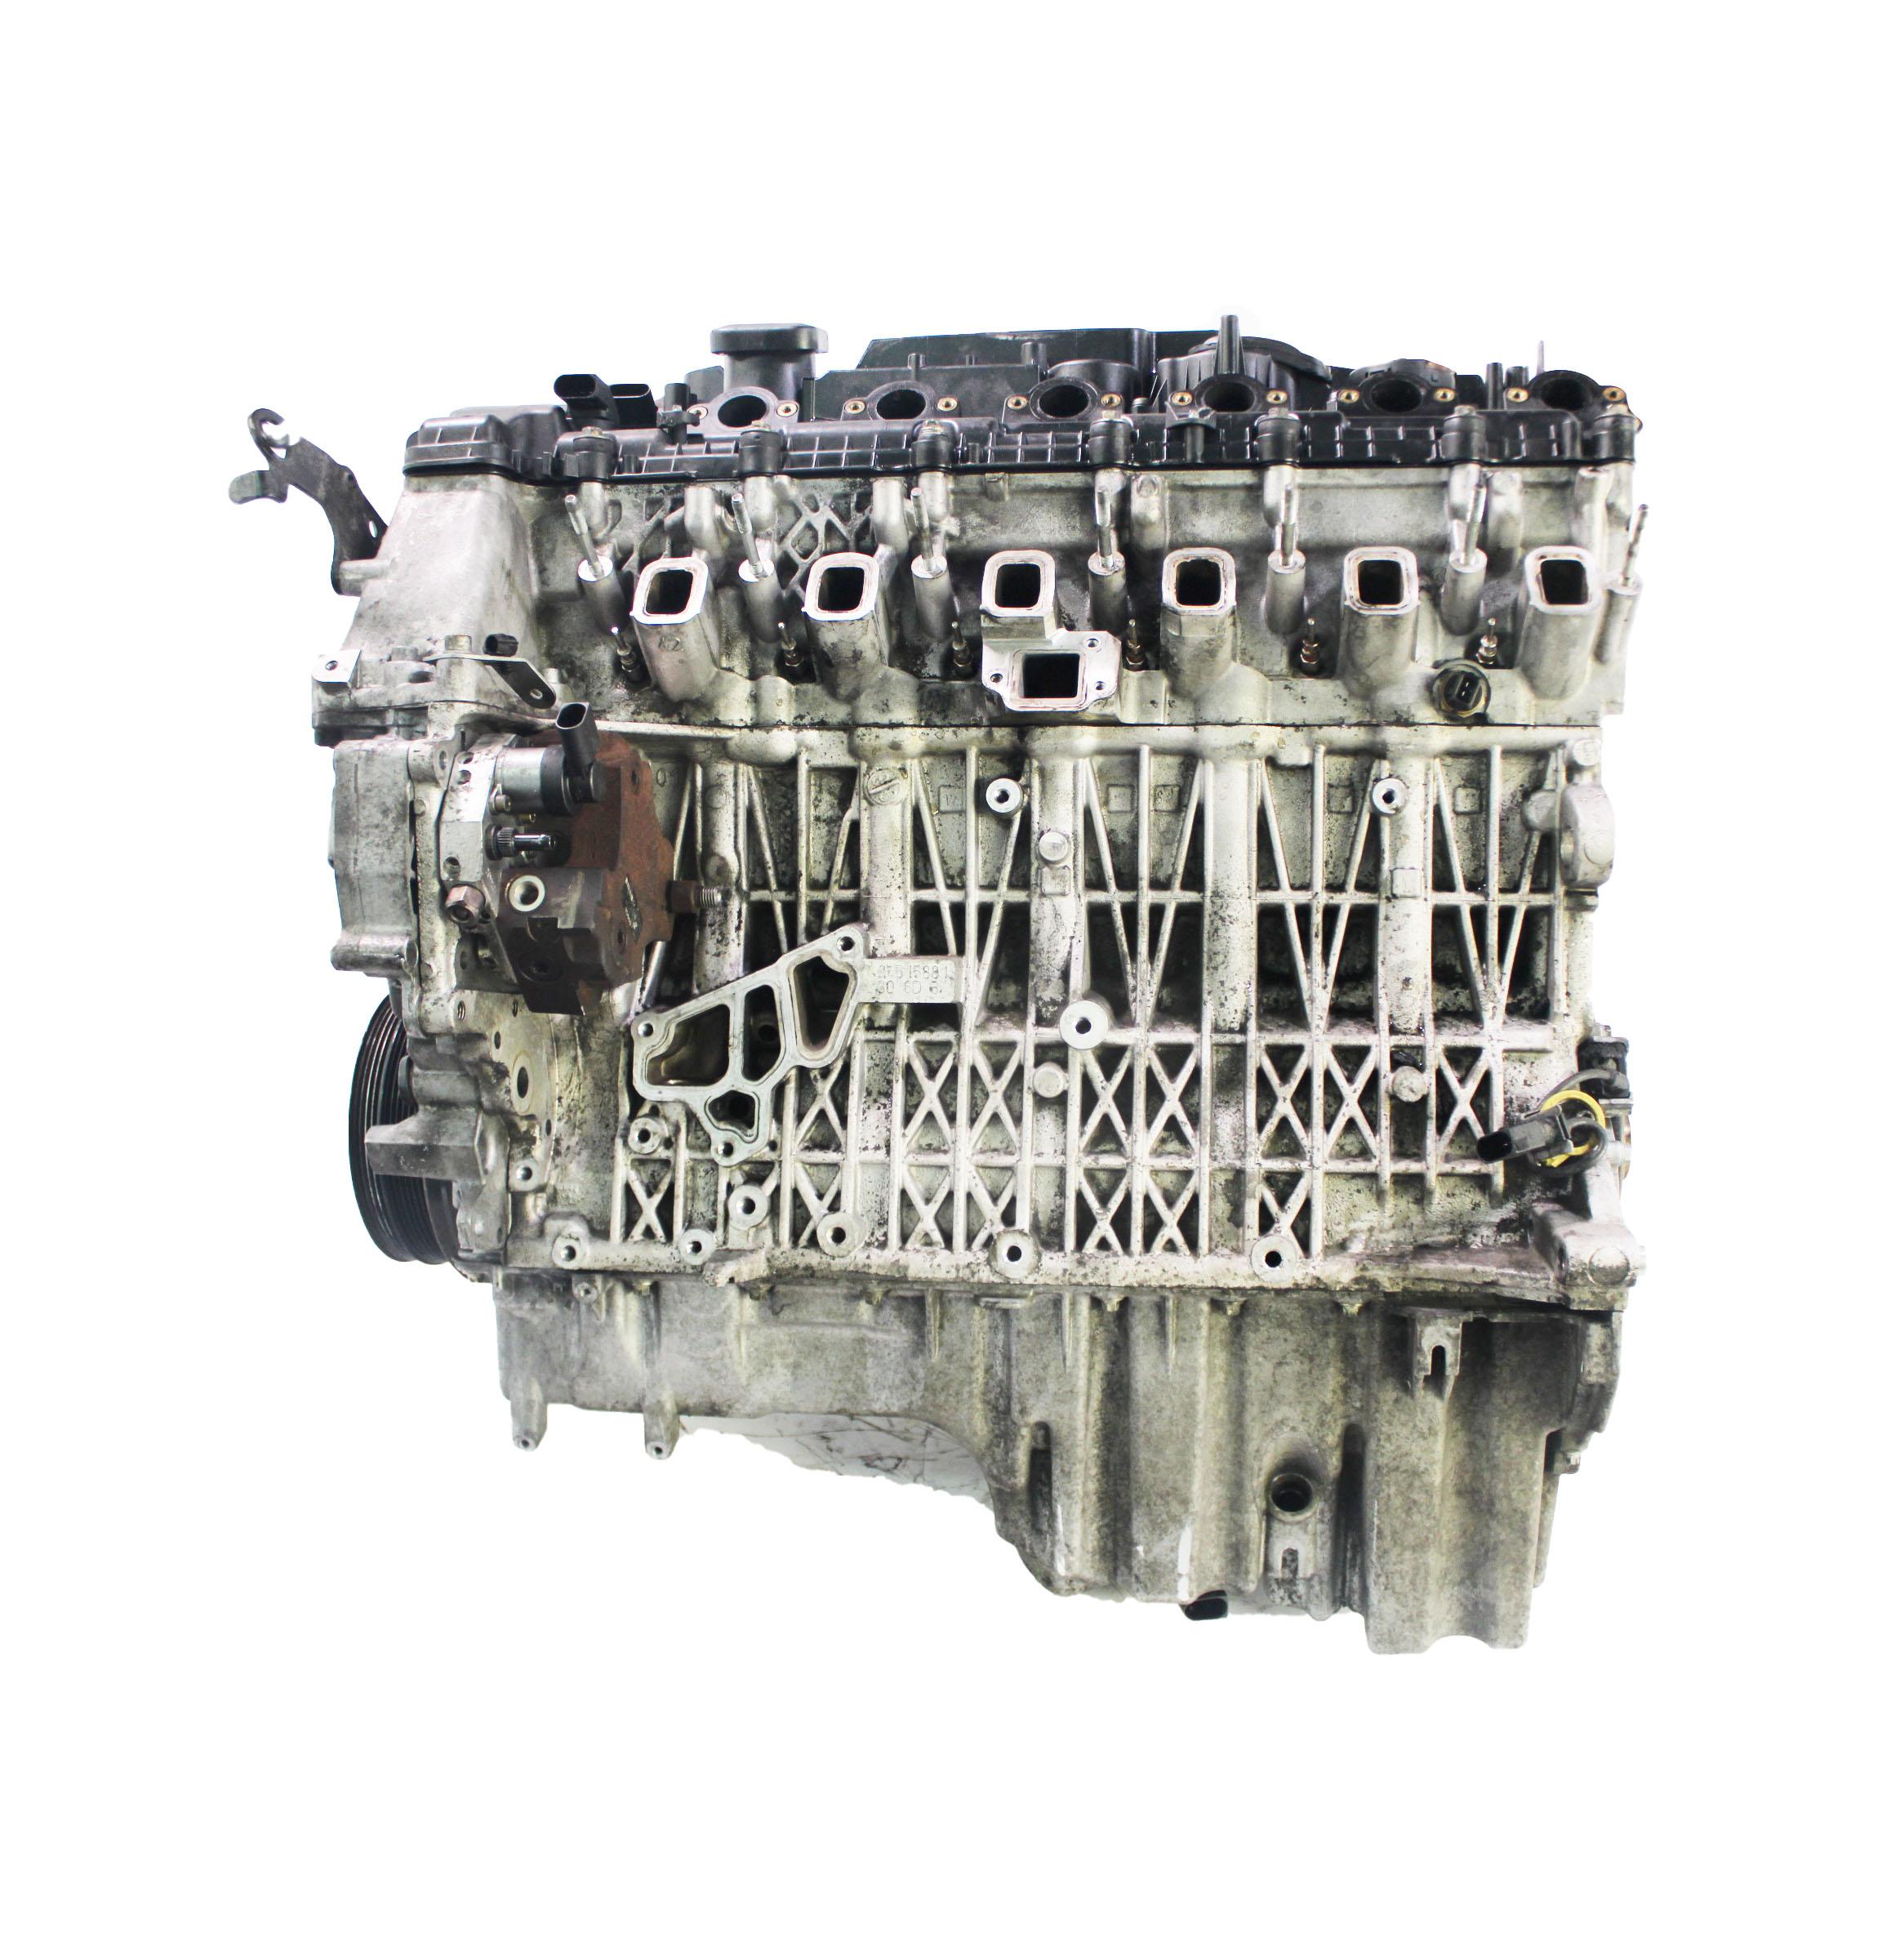 Motor für BMW 7er E65 E66 E67 730d 730 Ld 3,0 Diesel 306D3 M57D30 M57 231 PS